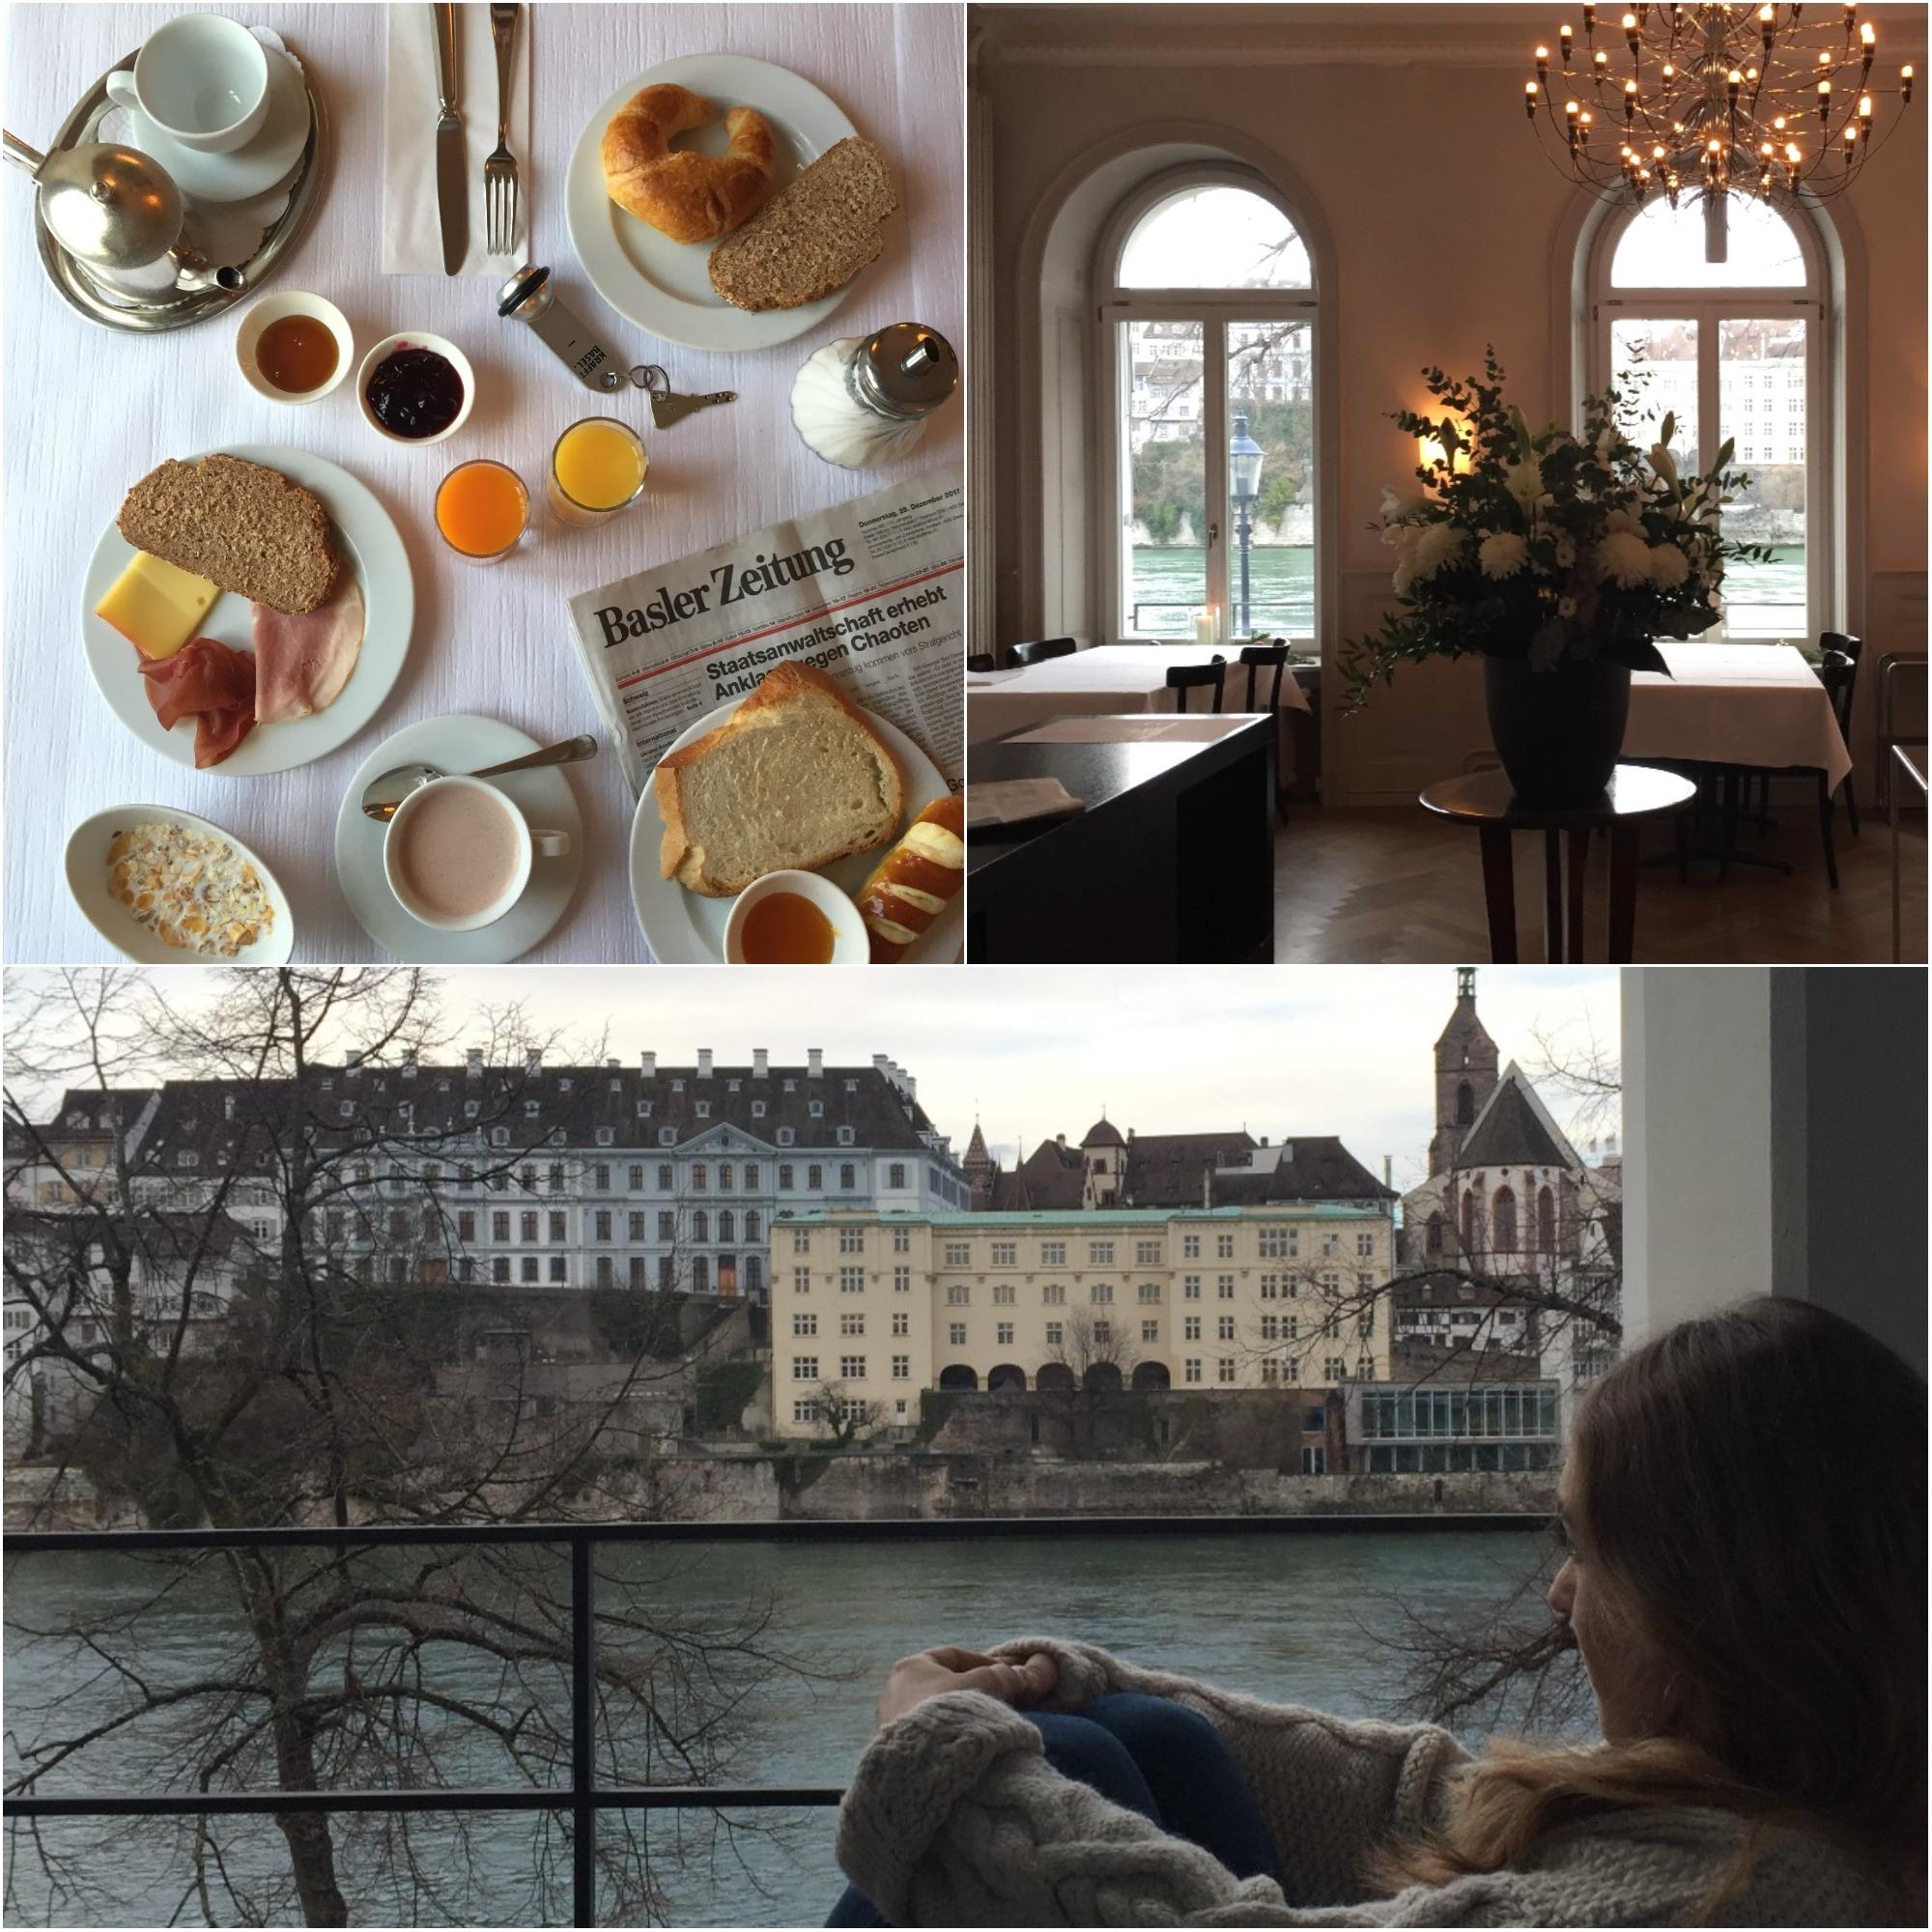 hotel Bâle avis hôtel krafft - blog voyage Suisse